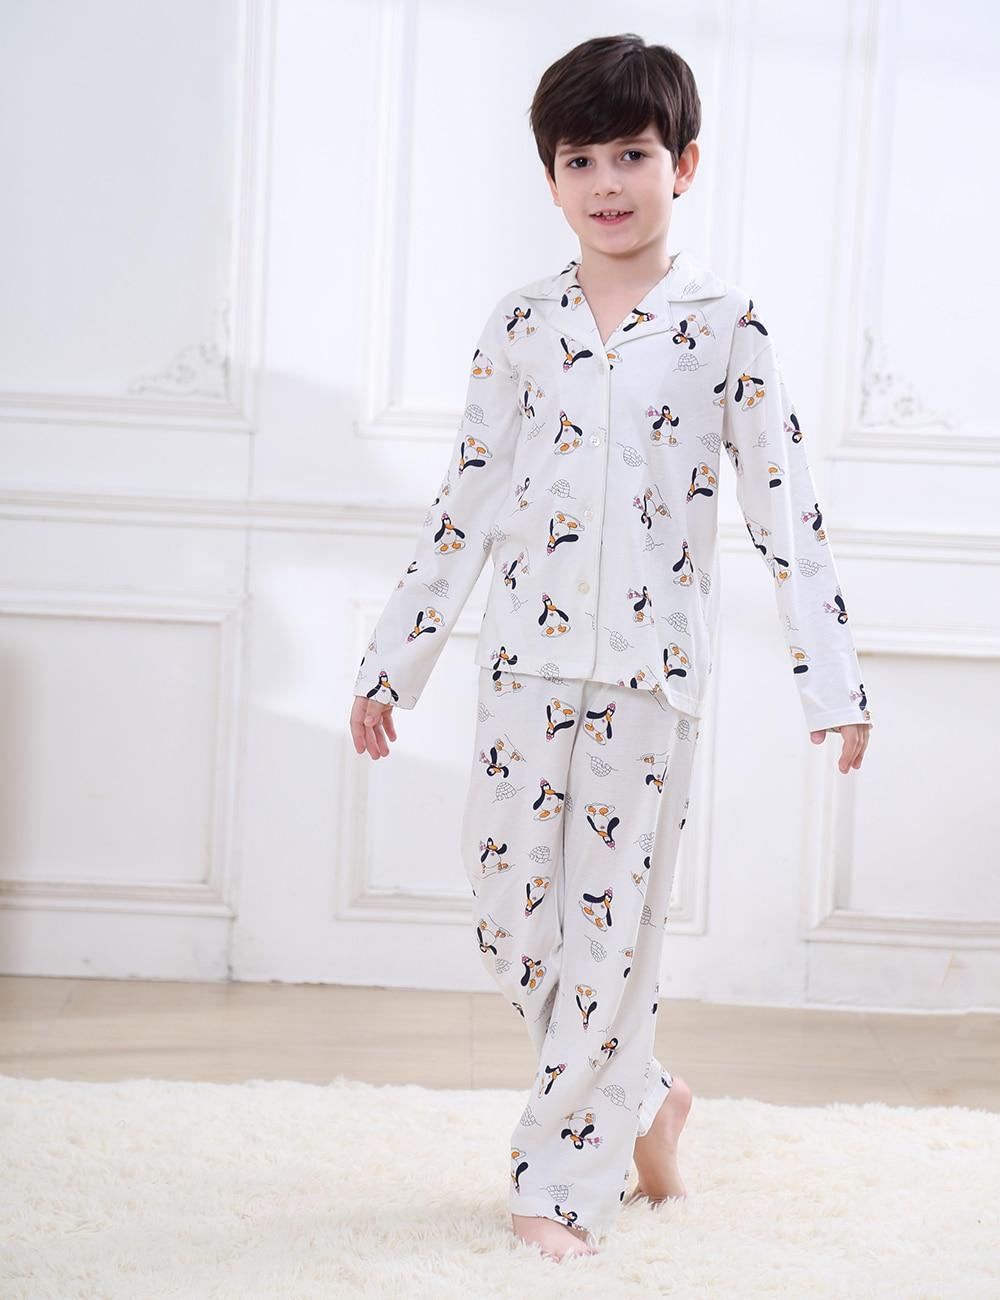 Skating Snowman Sits Girl Cotton Boys-Girls Sleepwear Pajama 2 Pcs Set